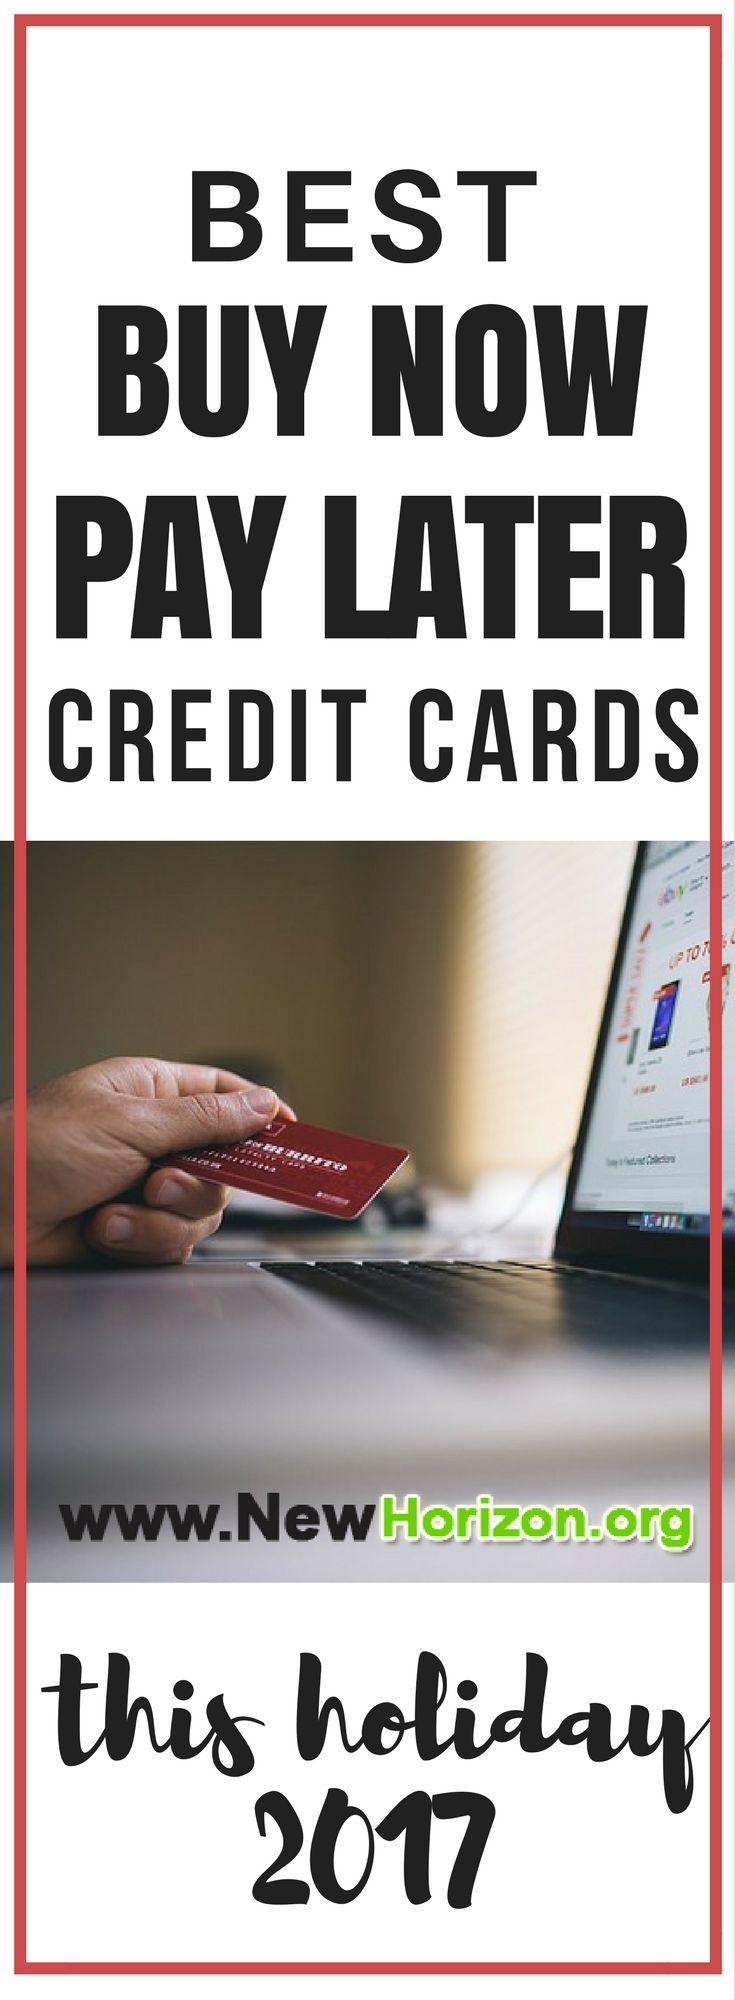 Merchandise Cards - Catalog Credit Cards | BAD CREDIT CREDIT